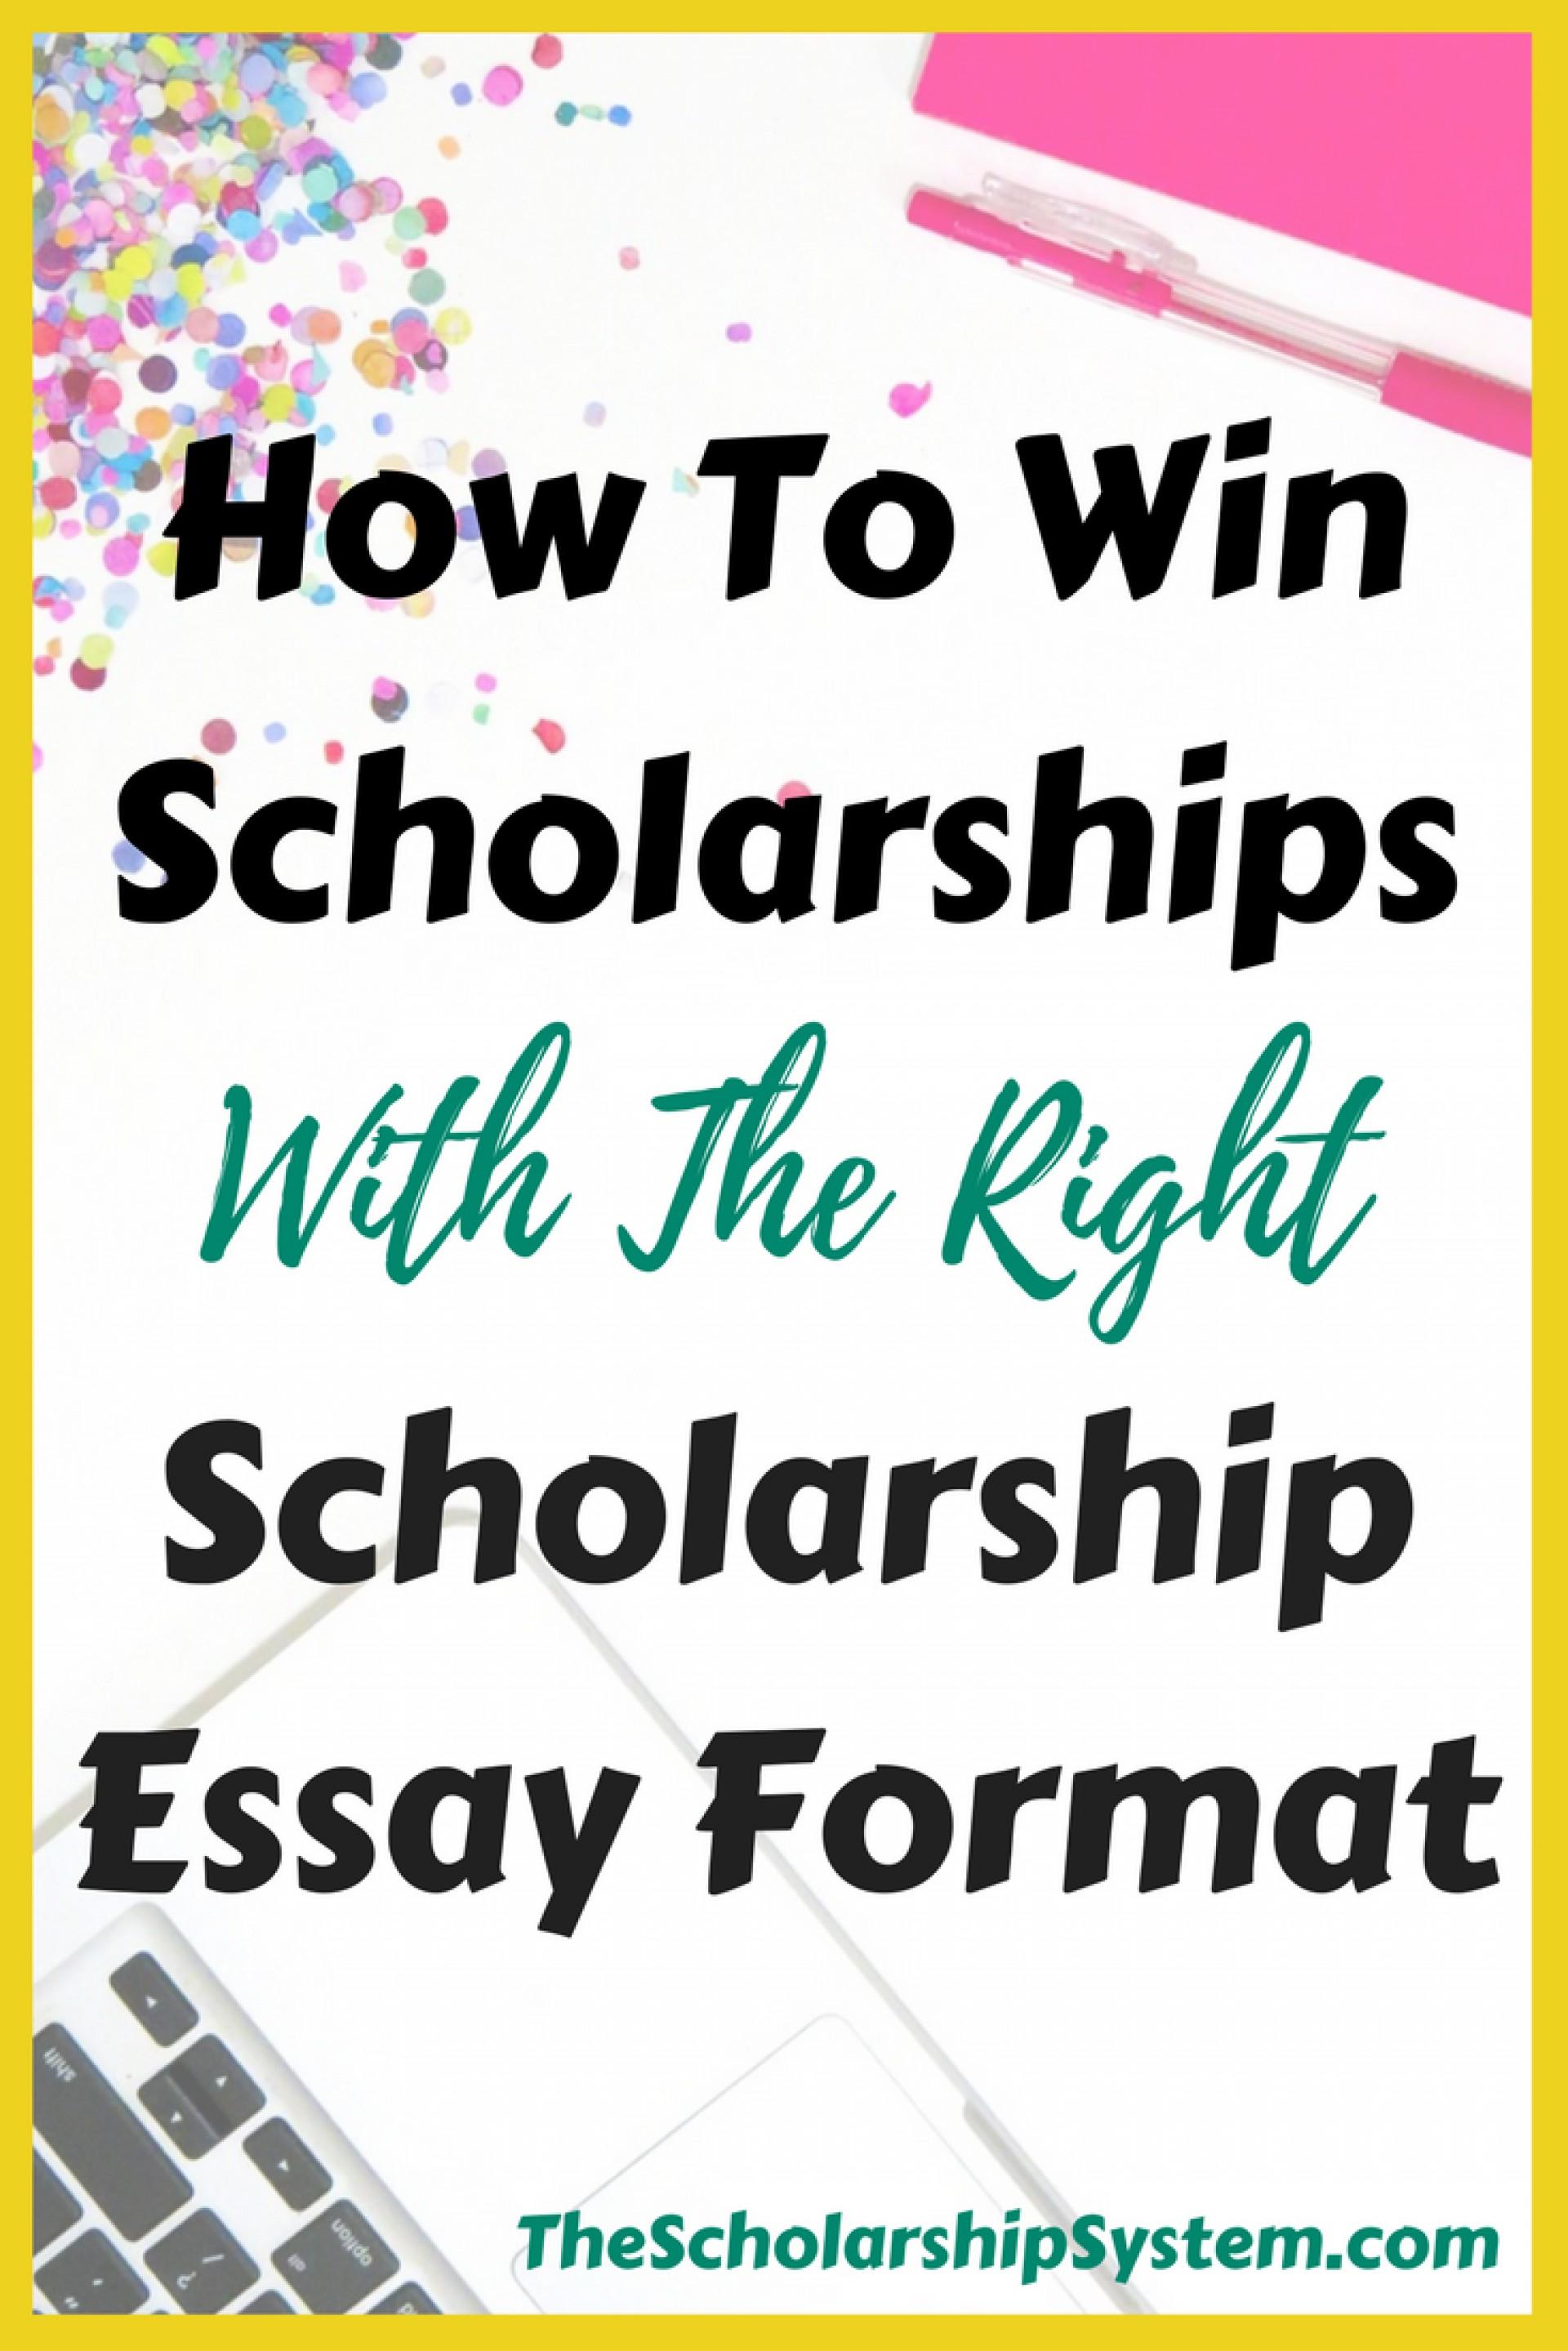 027 Format Scholarship Essay Sensational Sample College Essays For Writing 1920